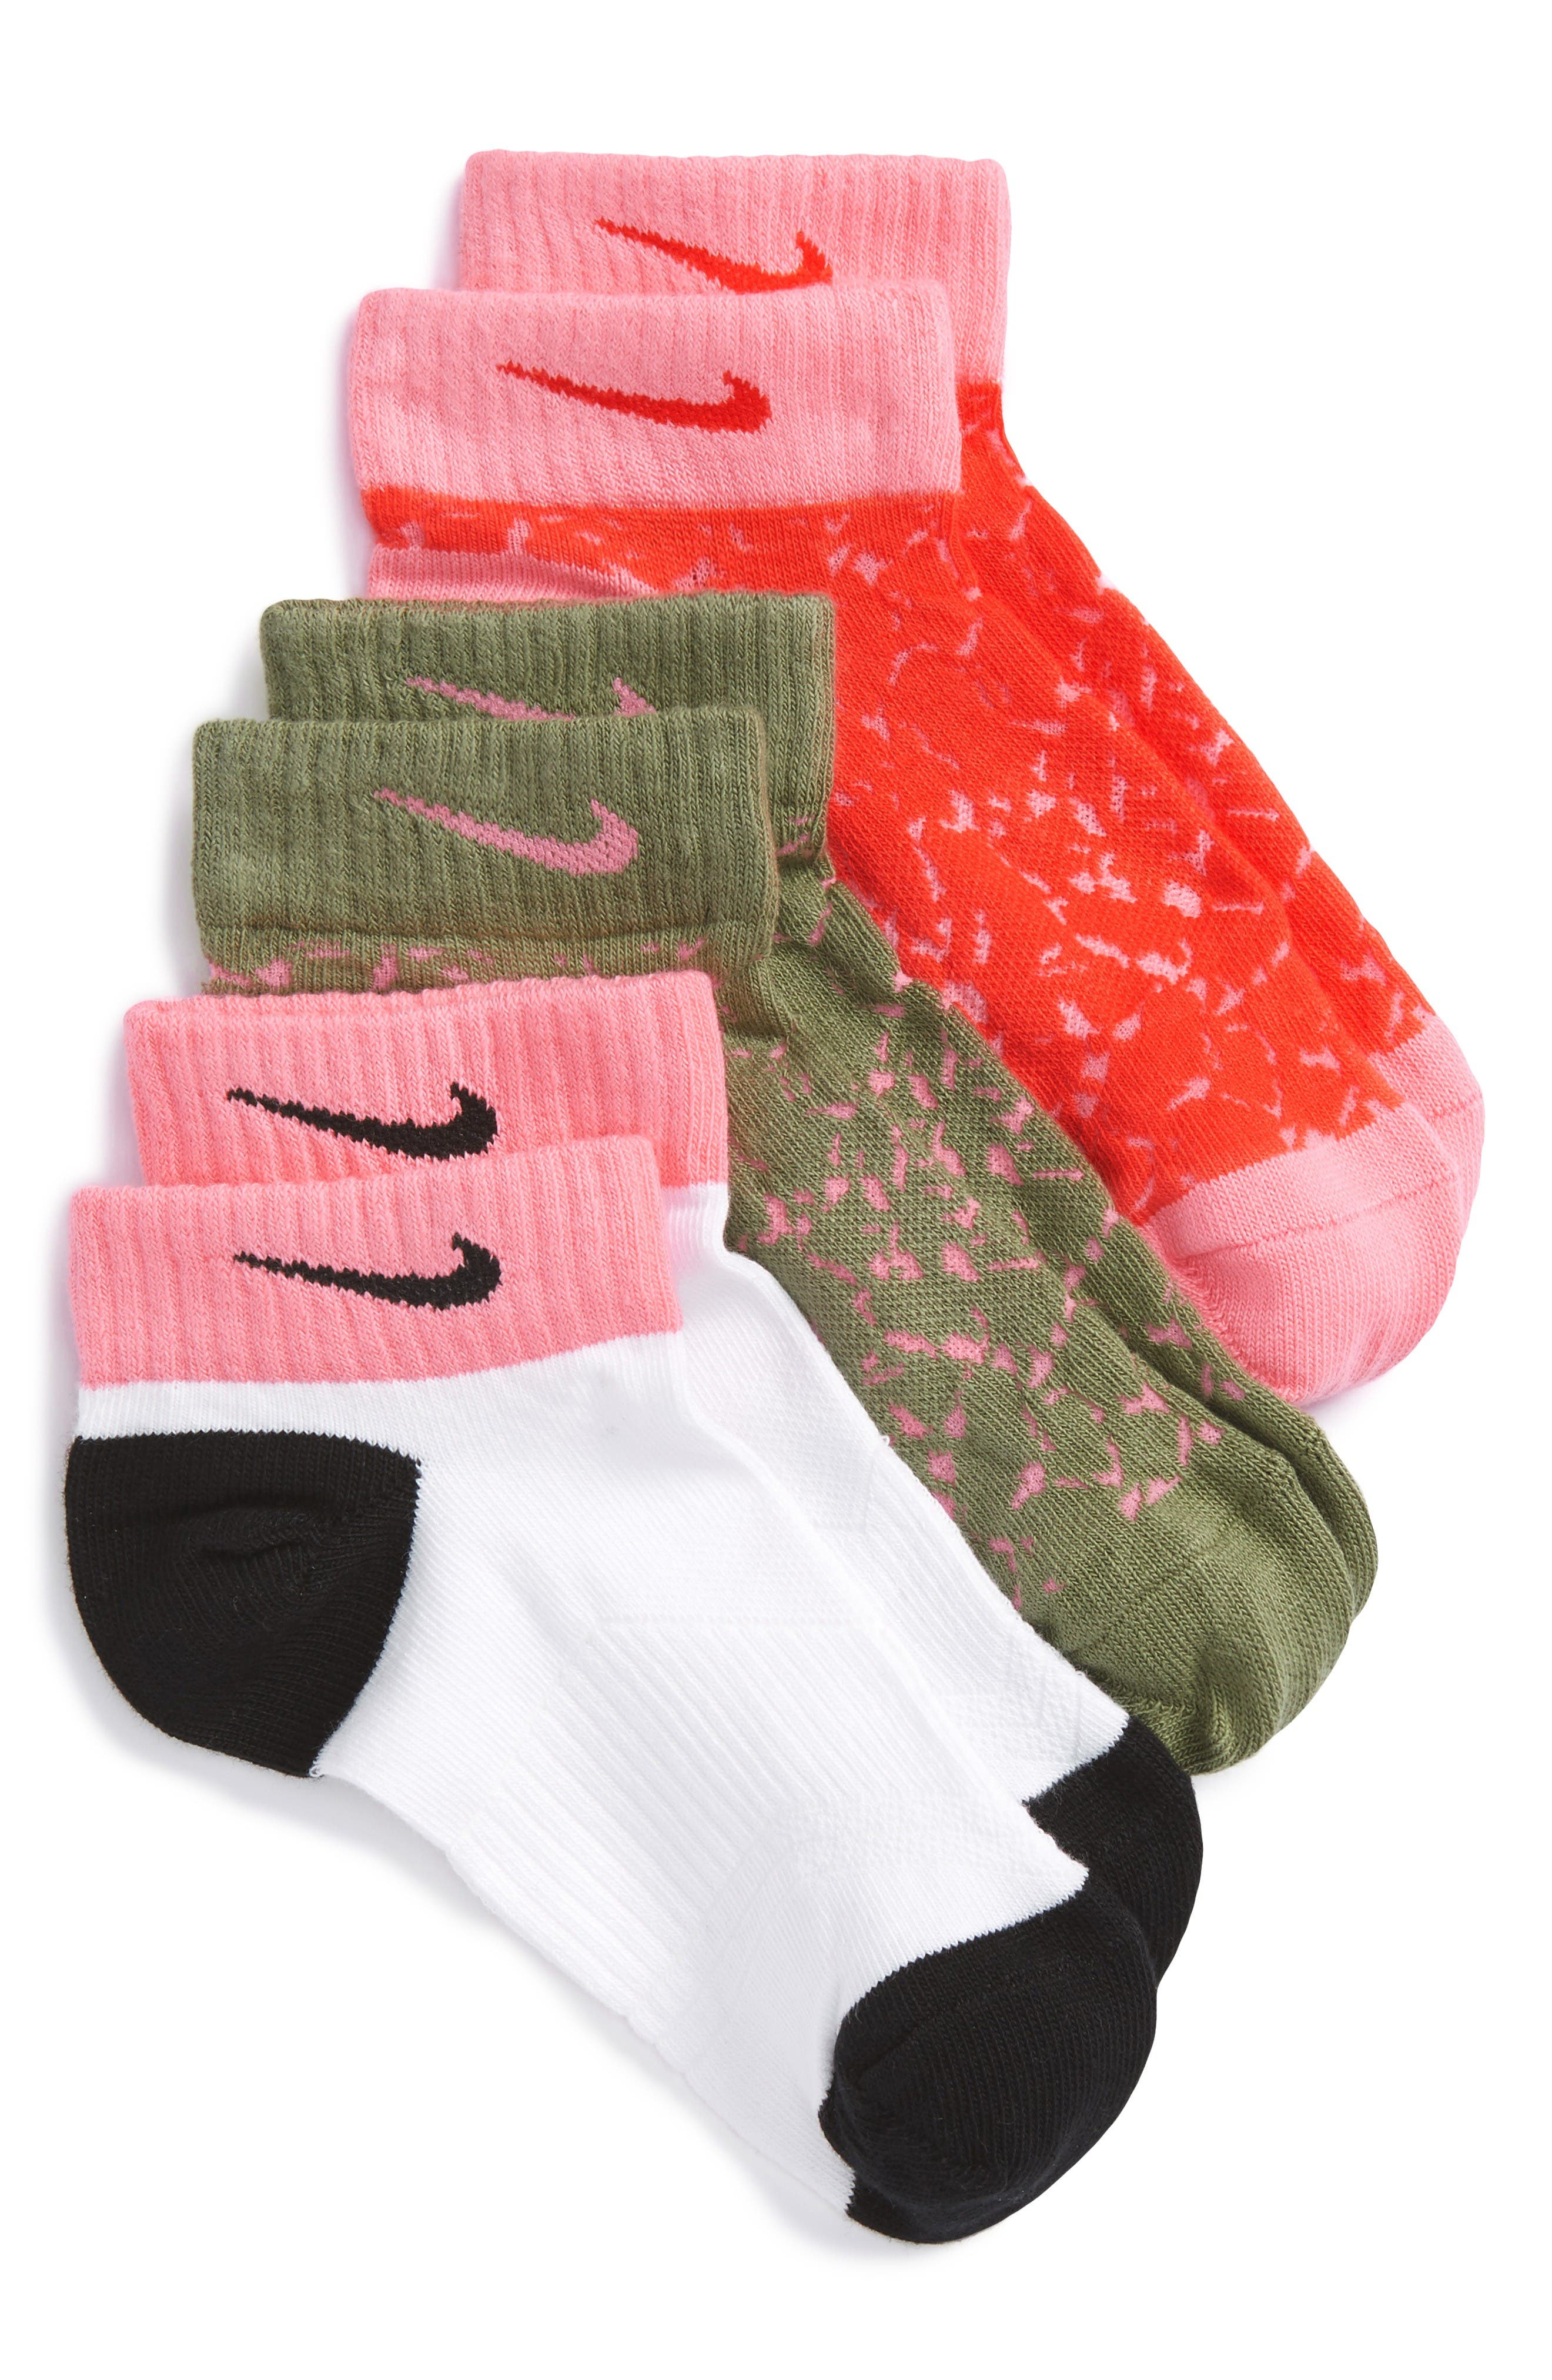 Low Cut Graphic Socks,                             Main thumbnail 1, color,                             Pink